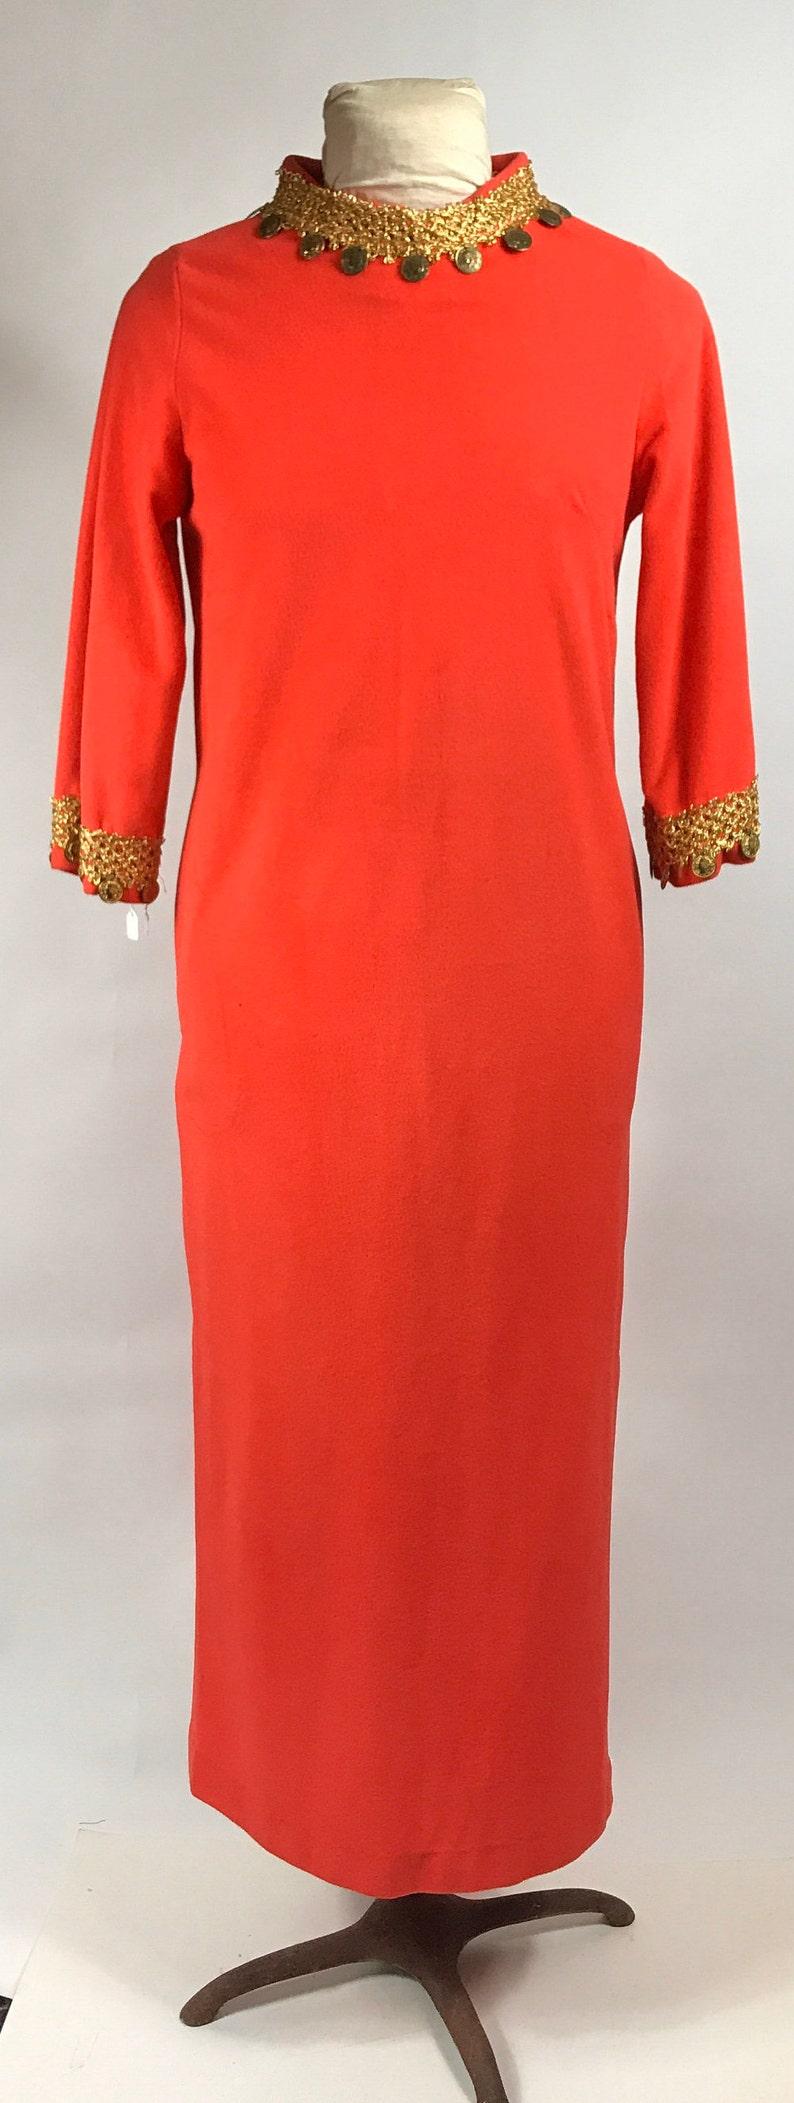 Vintage 1980s Janet Lynn Caftan Orange with Gold Braid and Coin Neckline and Trim Kaftan Long Dress Floor Length Loungewear